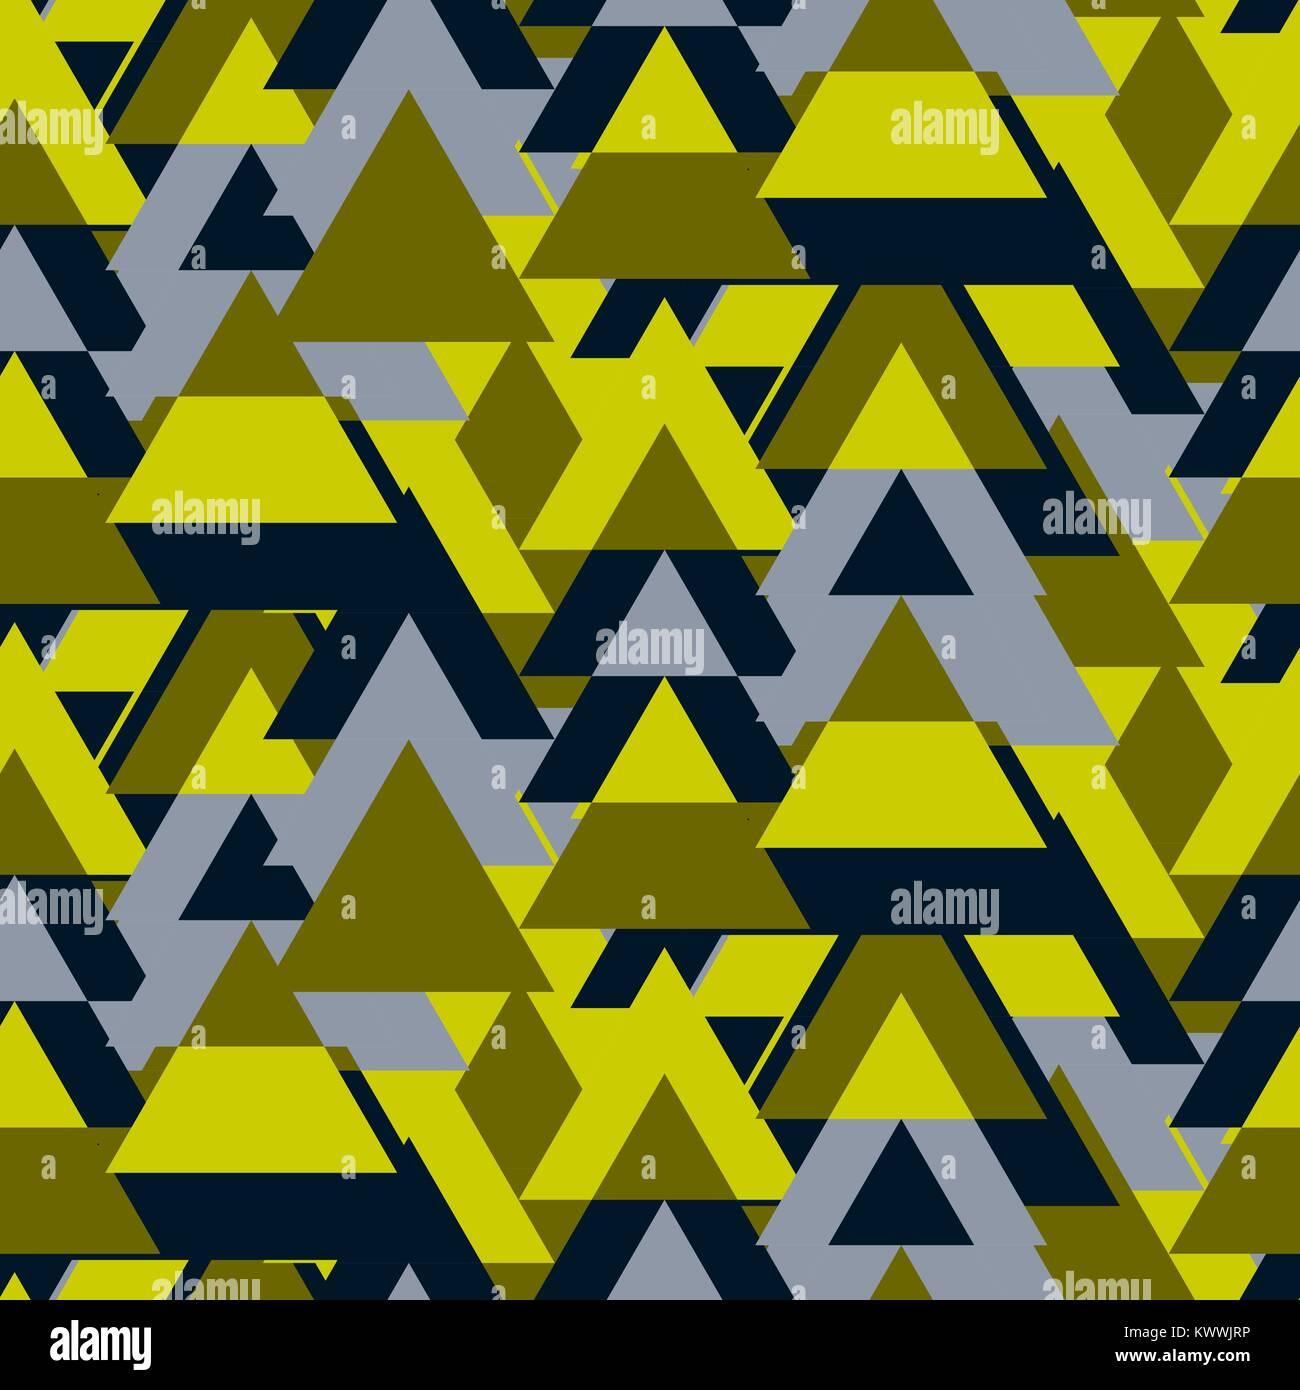 Triangle camo bold seamless vector pattern. - Stock Image